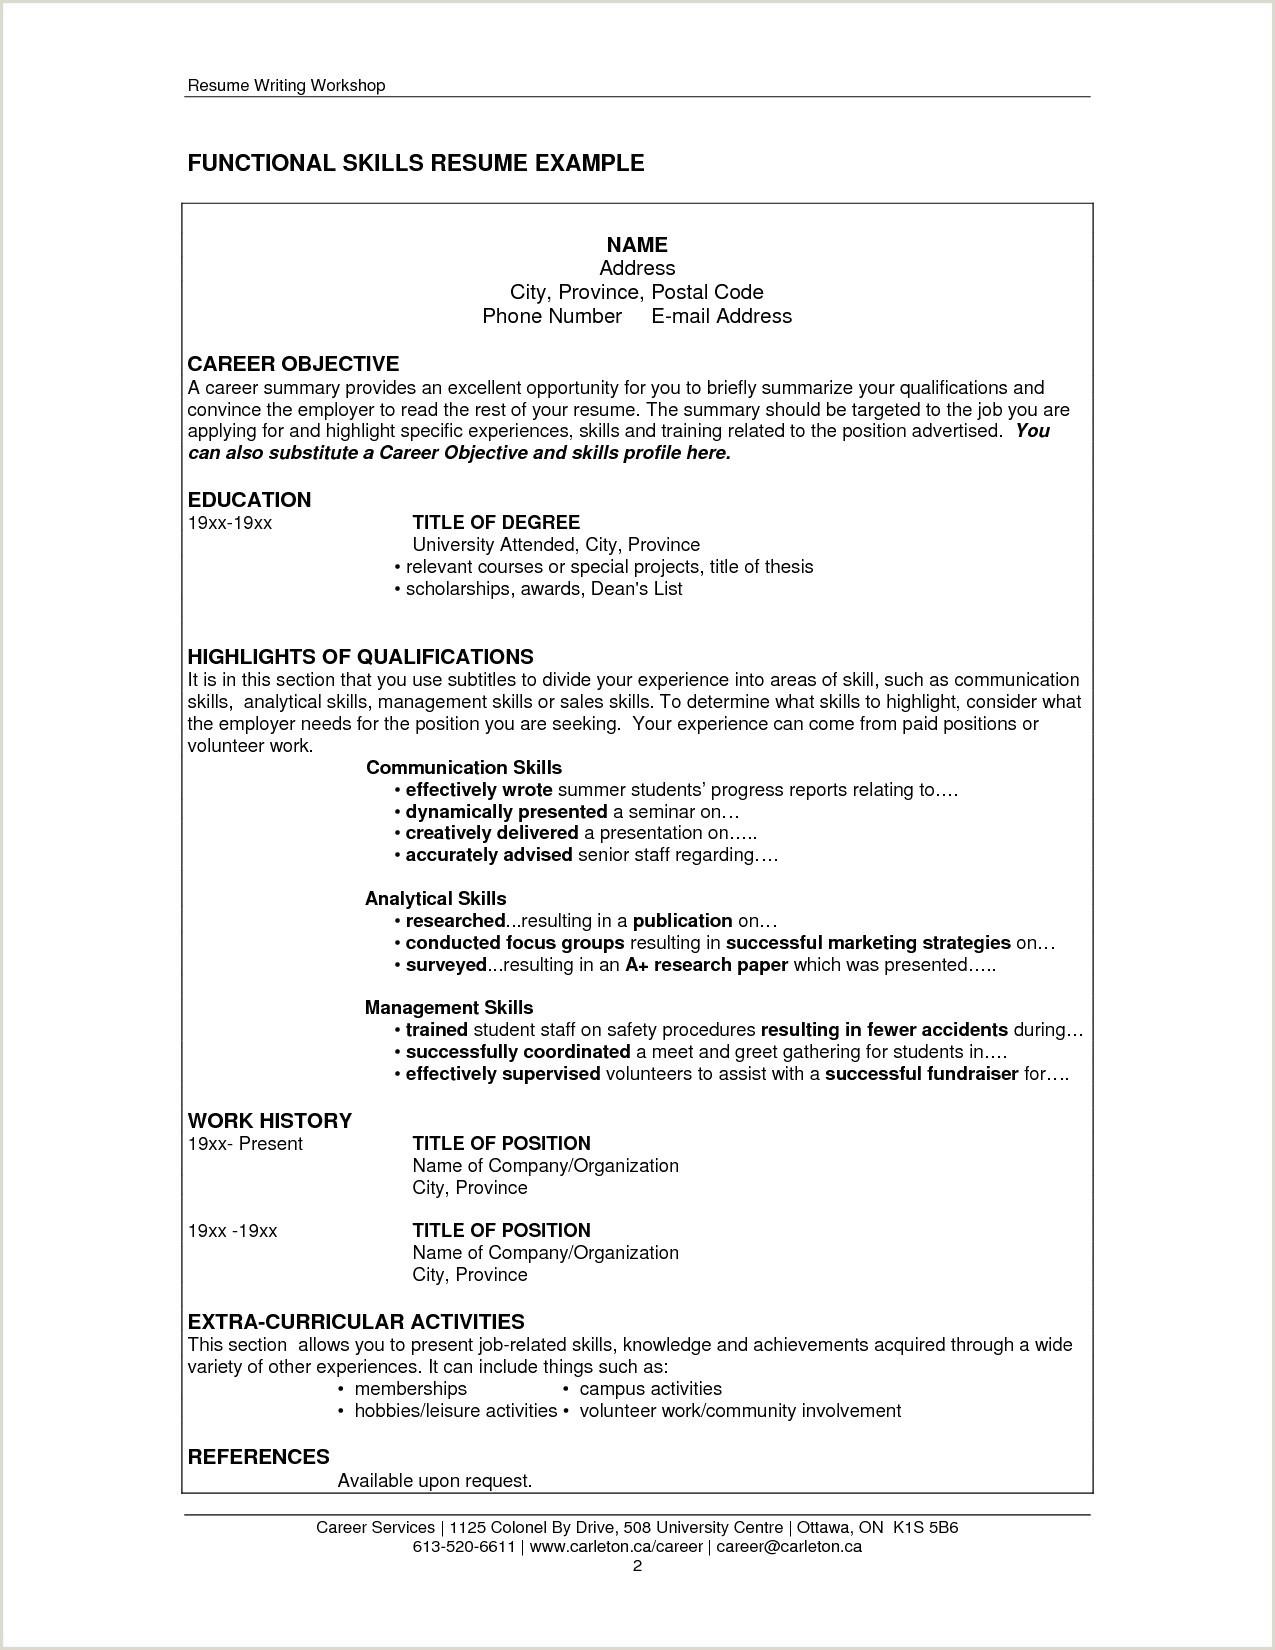 Cvs Resume Paper – Kizi games